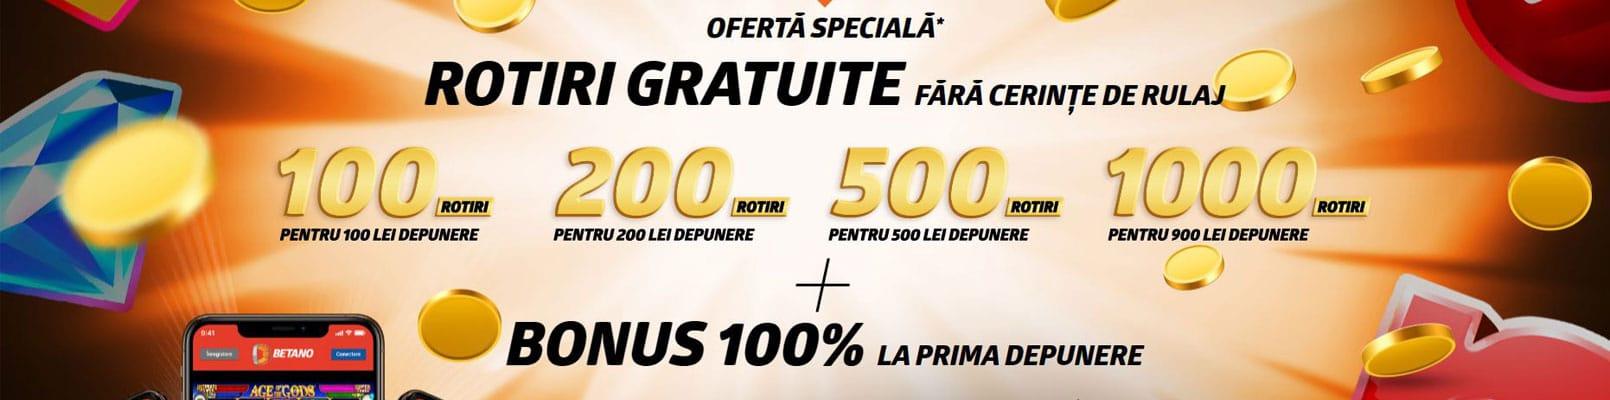 500 RON bonus bun venit betano